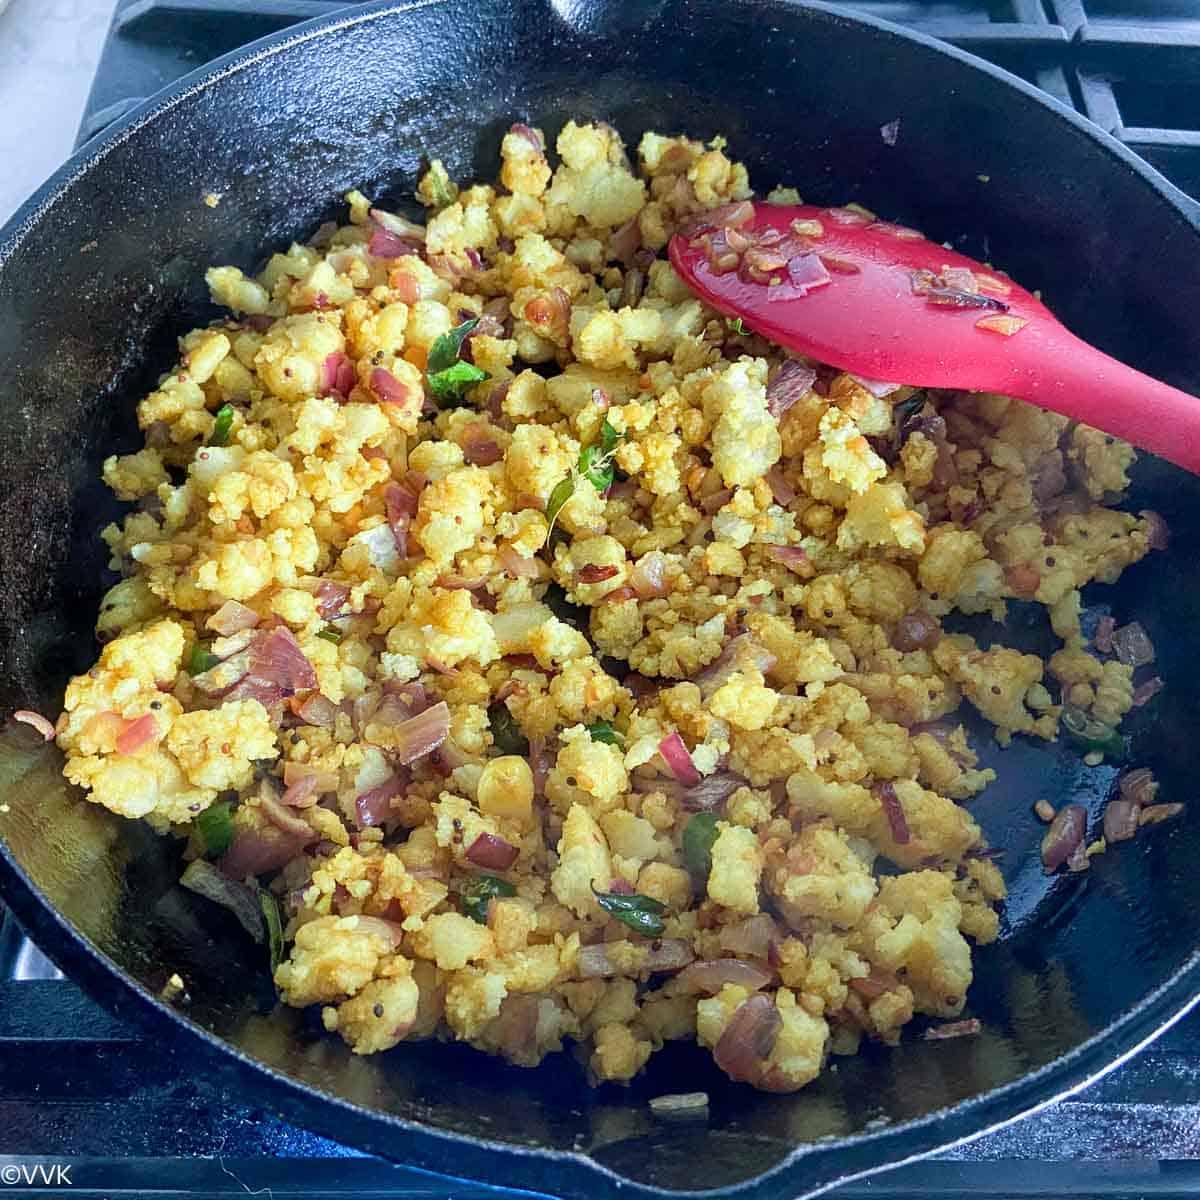 cooking the idli upma over medium-low heat